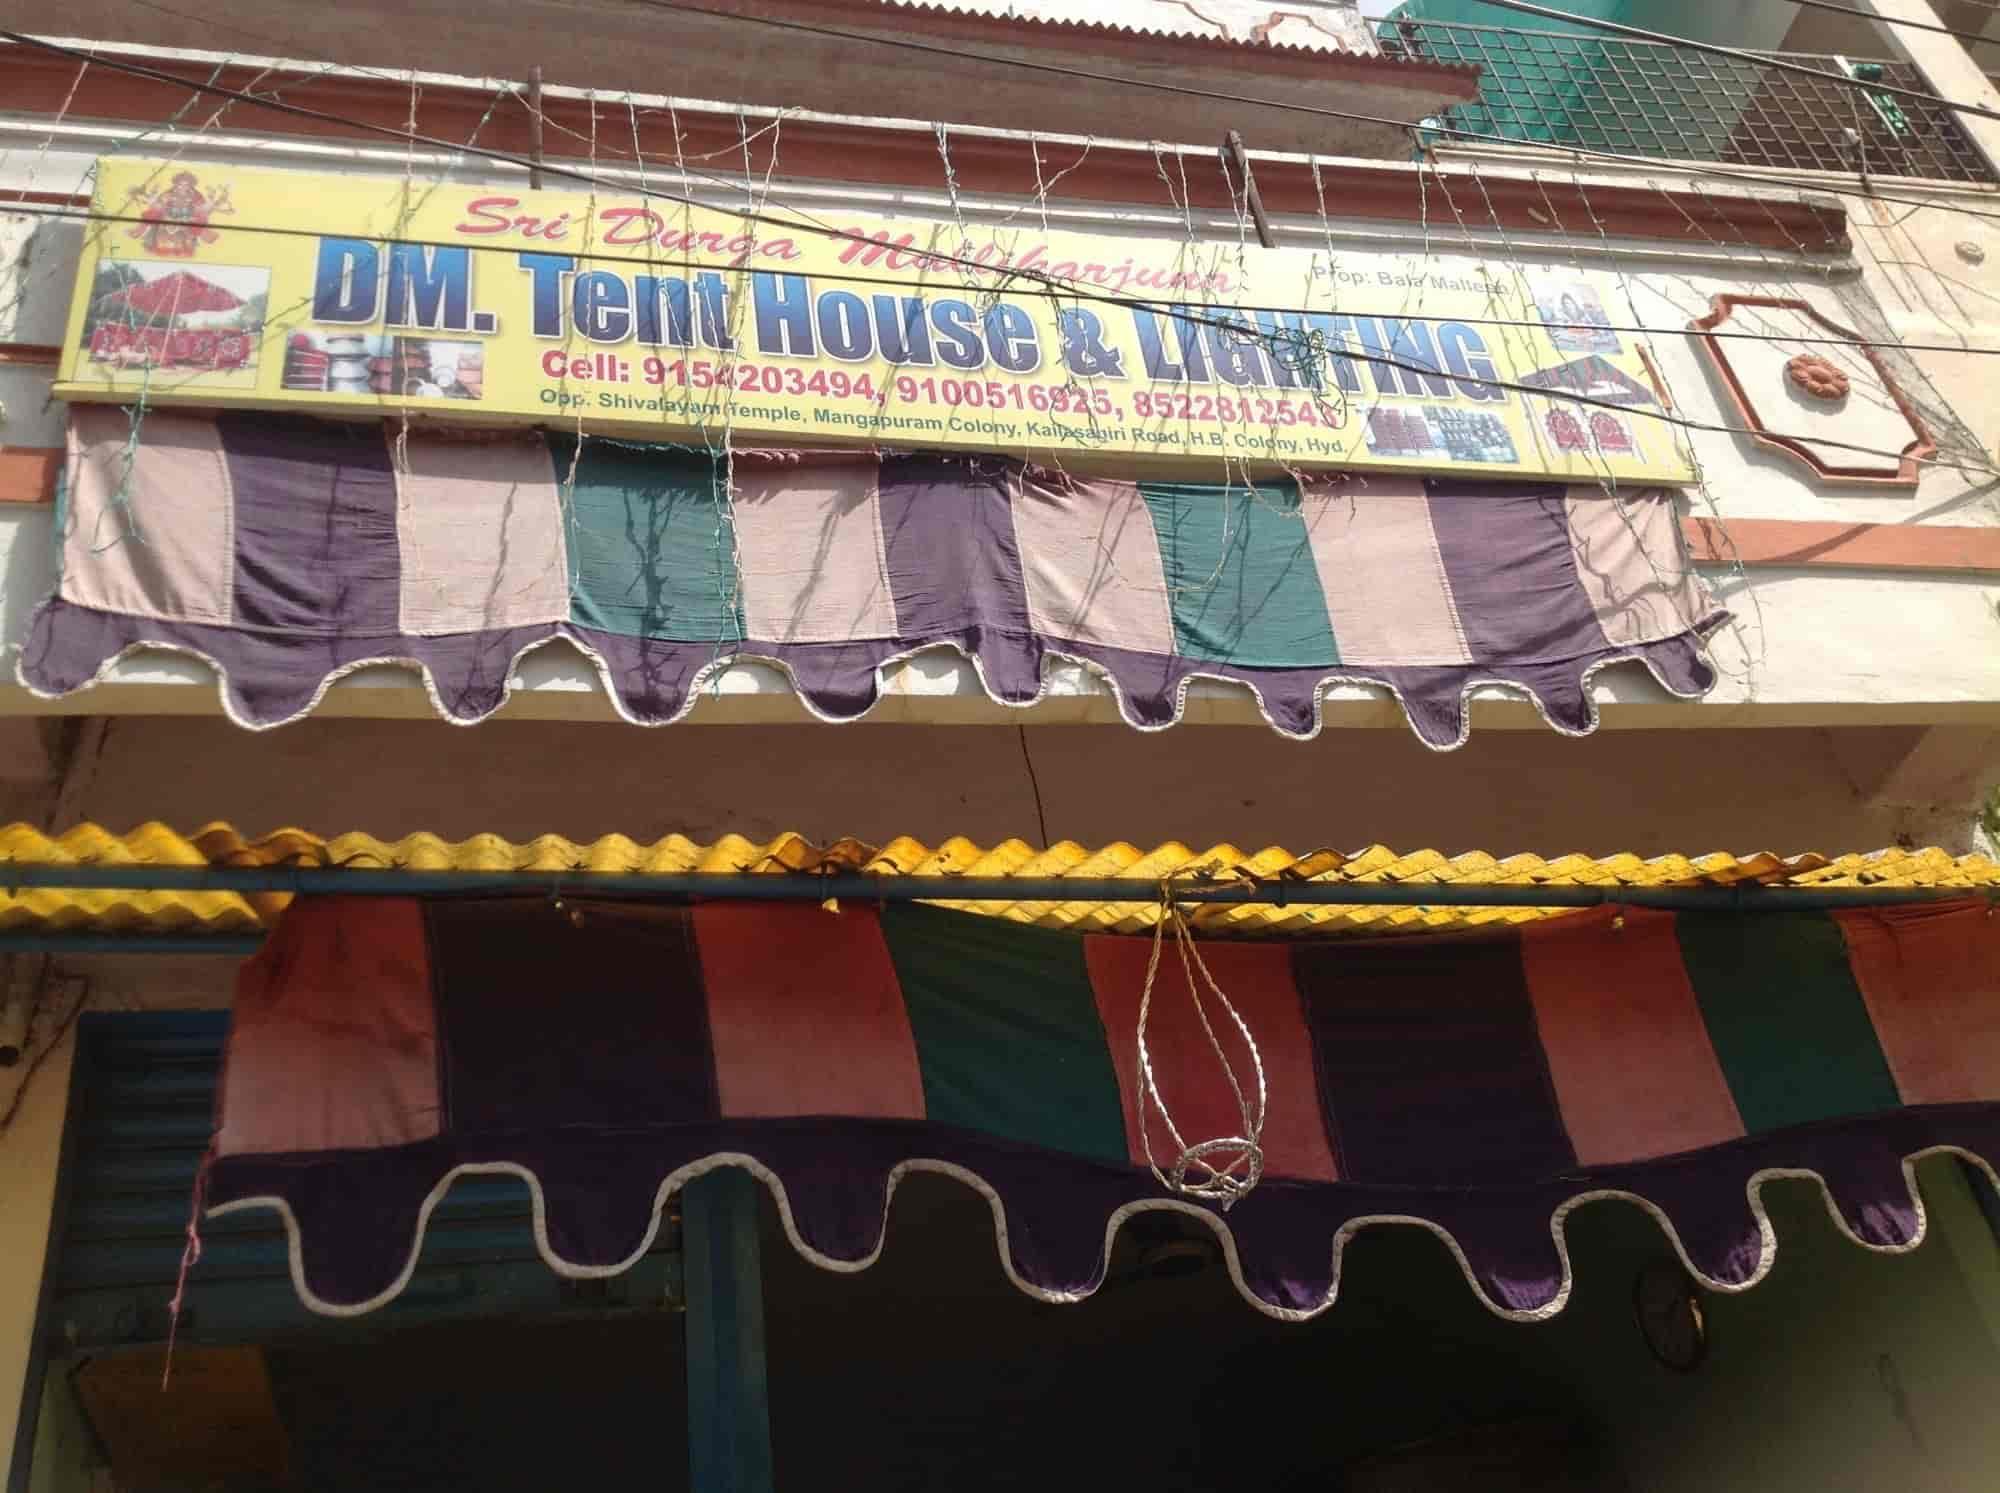 DM Tent House And Sounds Photos Moula Ali Hyderabad - Tent House ... & DM Tent House And Sounds Photos Moula Ali Hyderabad- Pictures ...